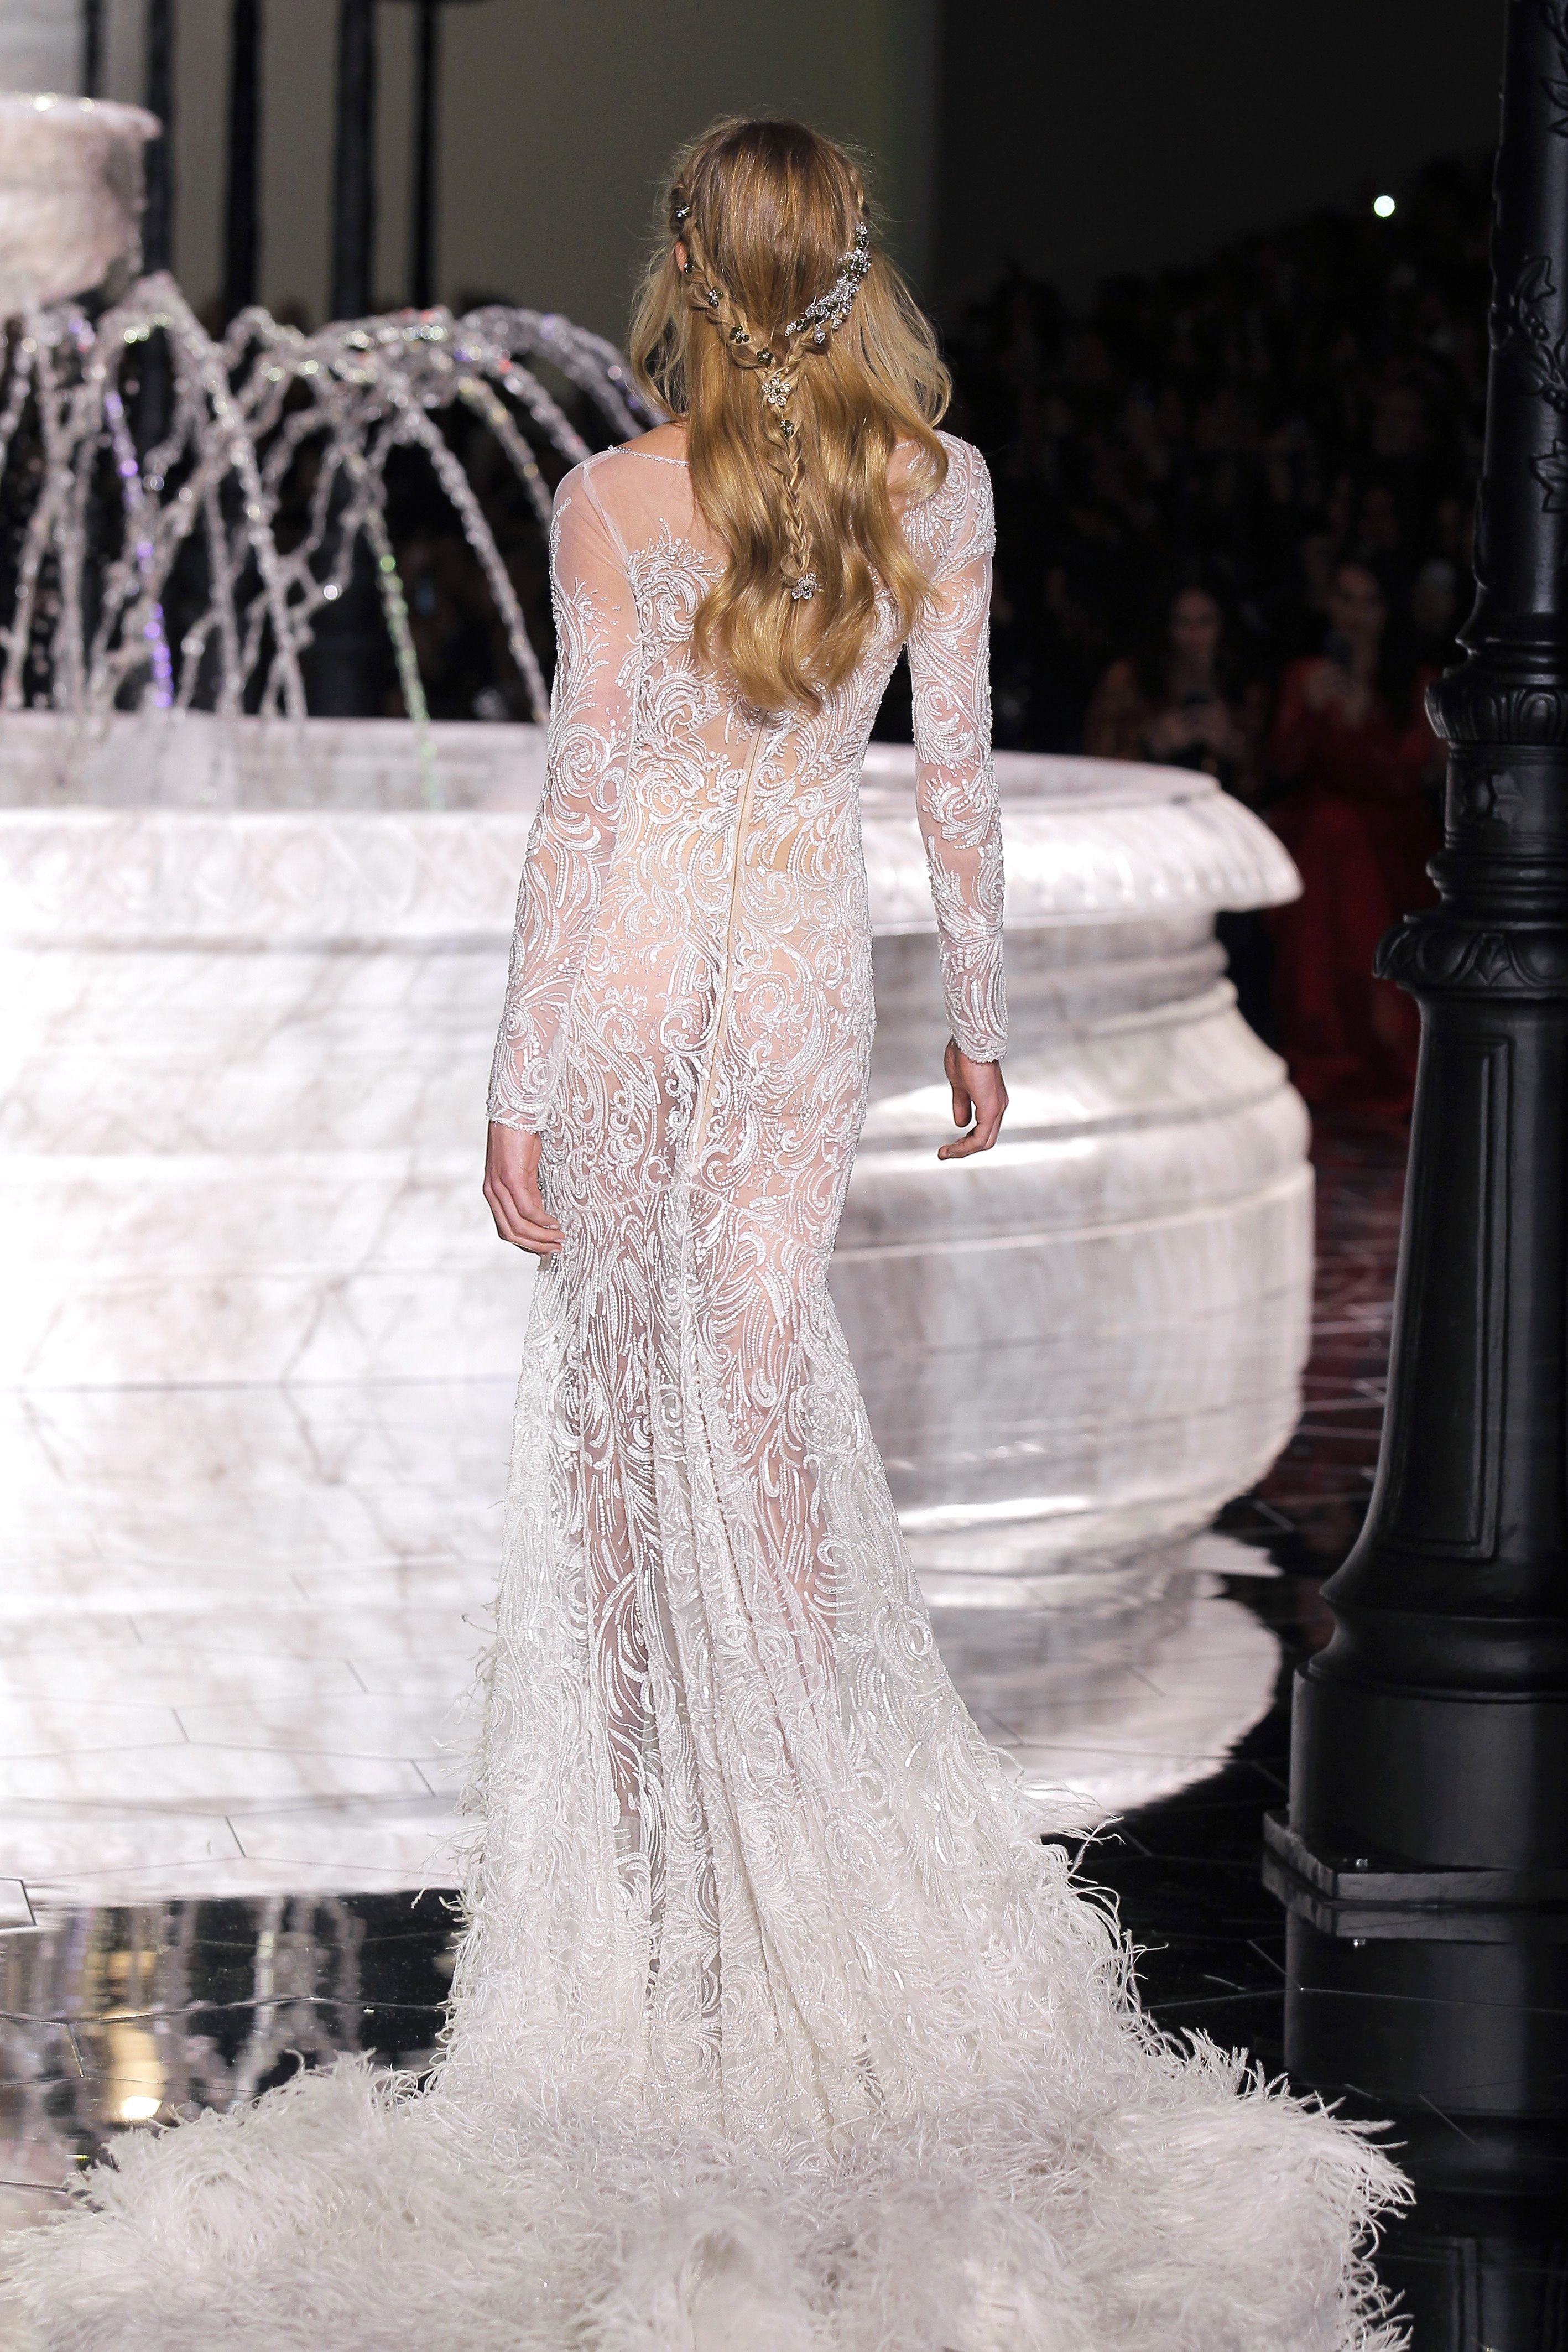 Pronovias Wedding Dress. Find Pronovias and More at Here Comes the ...